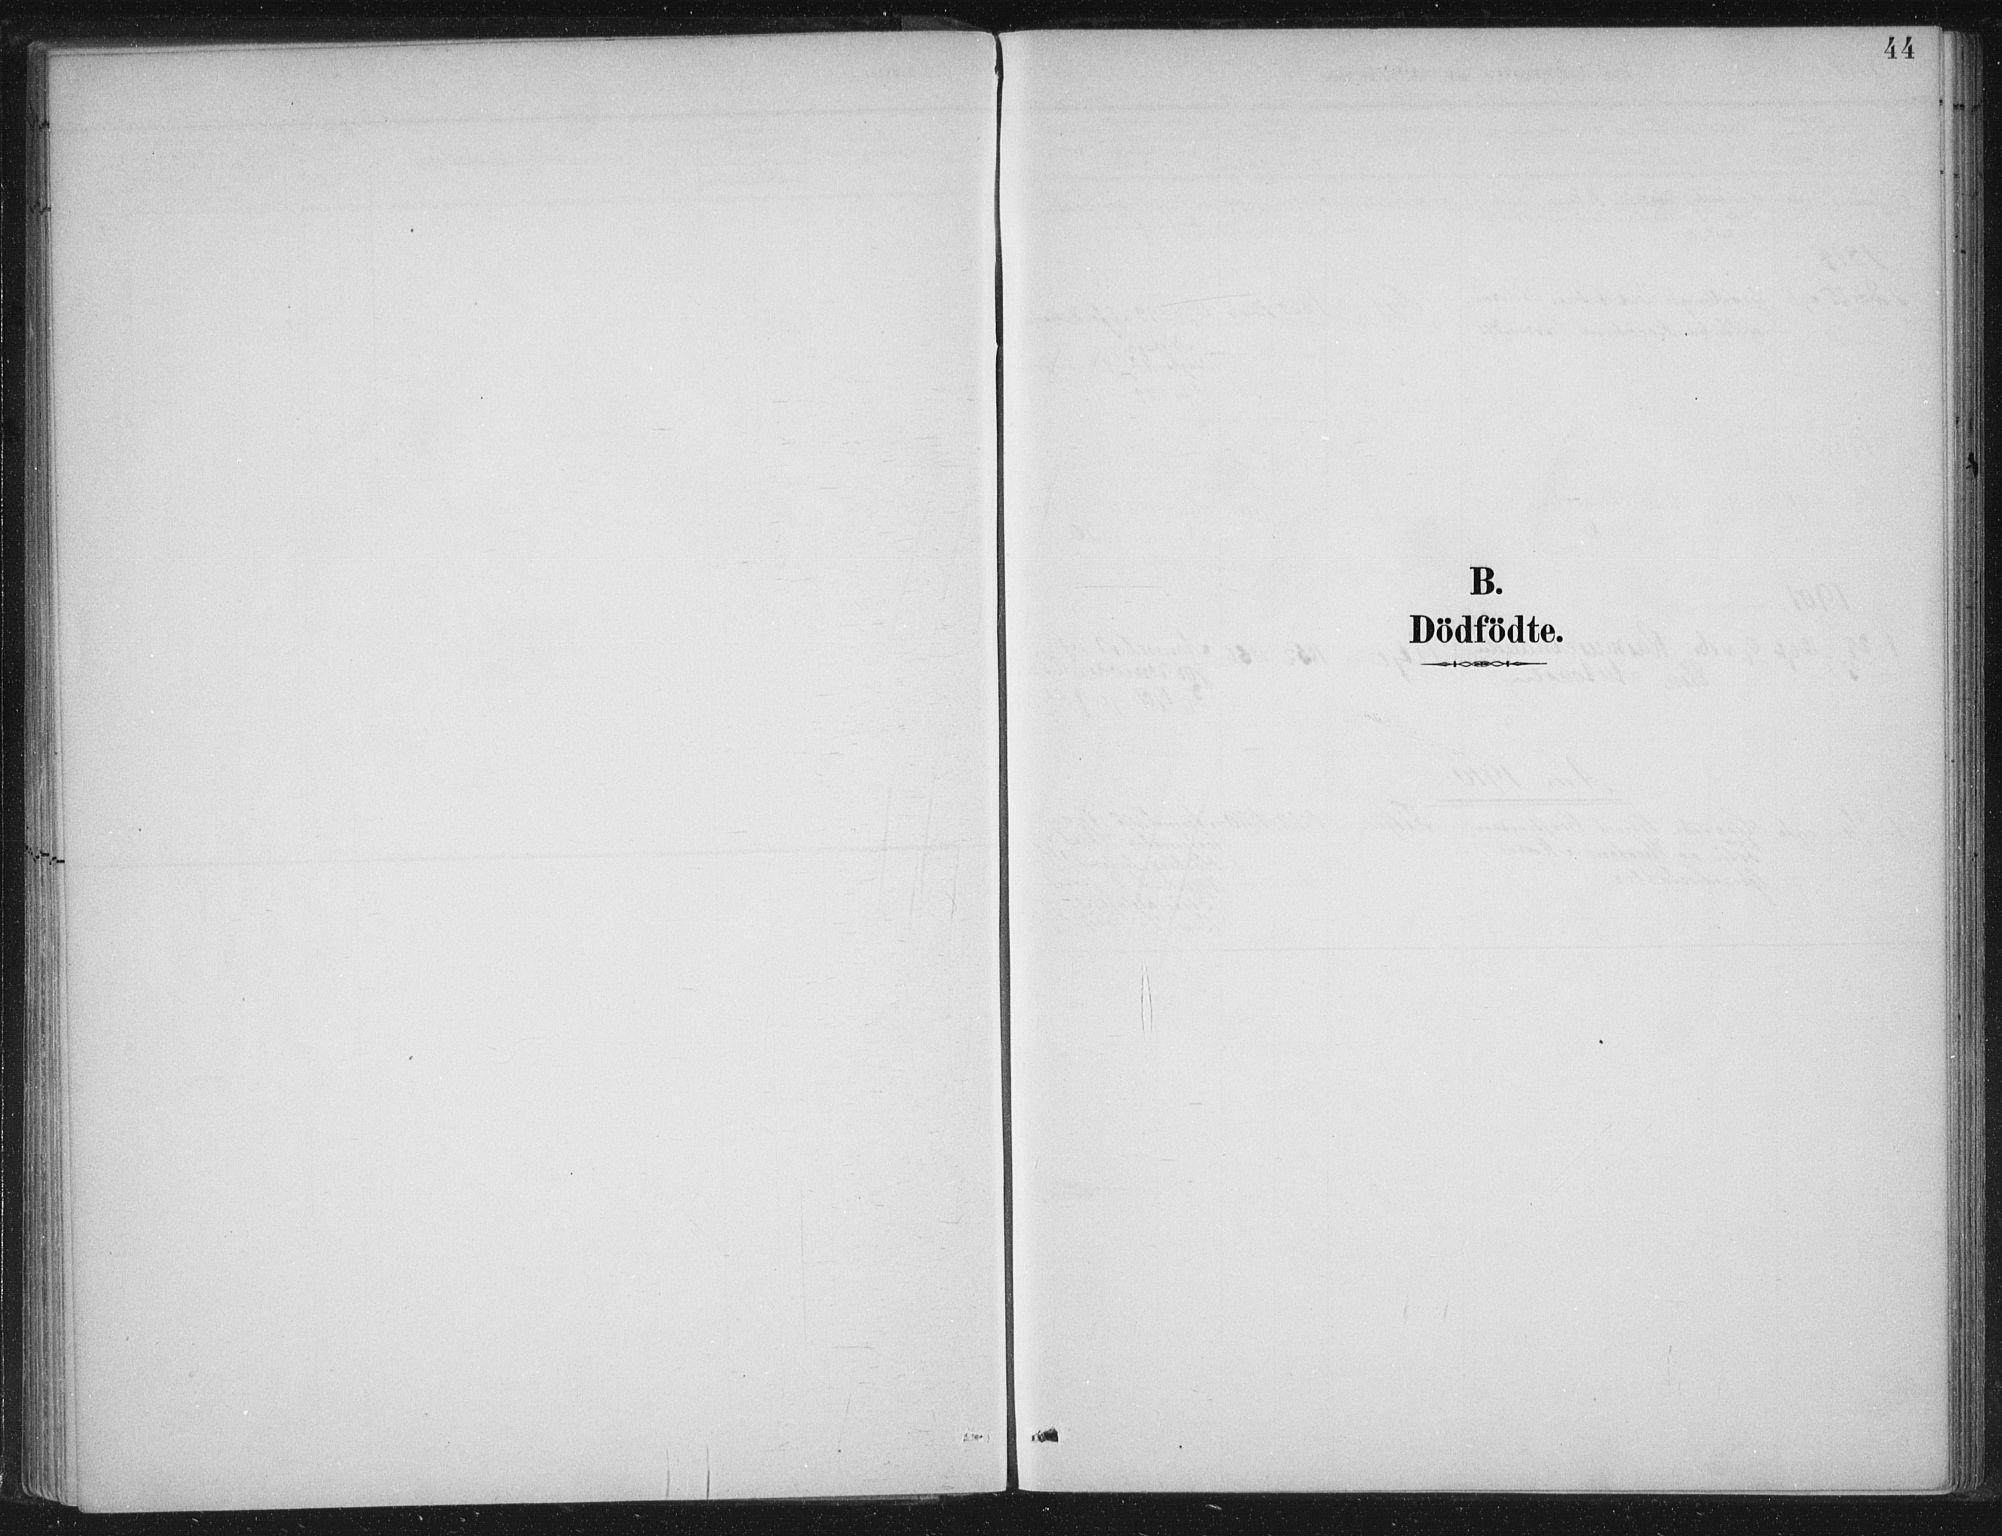 SAB, Gloppen sokneprestembete, H/Haa/Haad/L0001: Ministerialbok nr. D  1, 1885-1910, s. 44